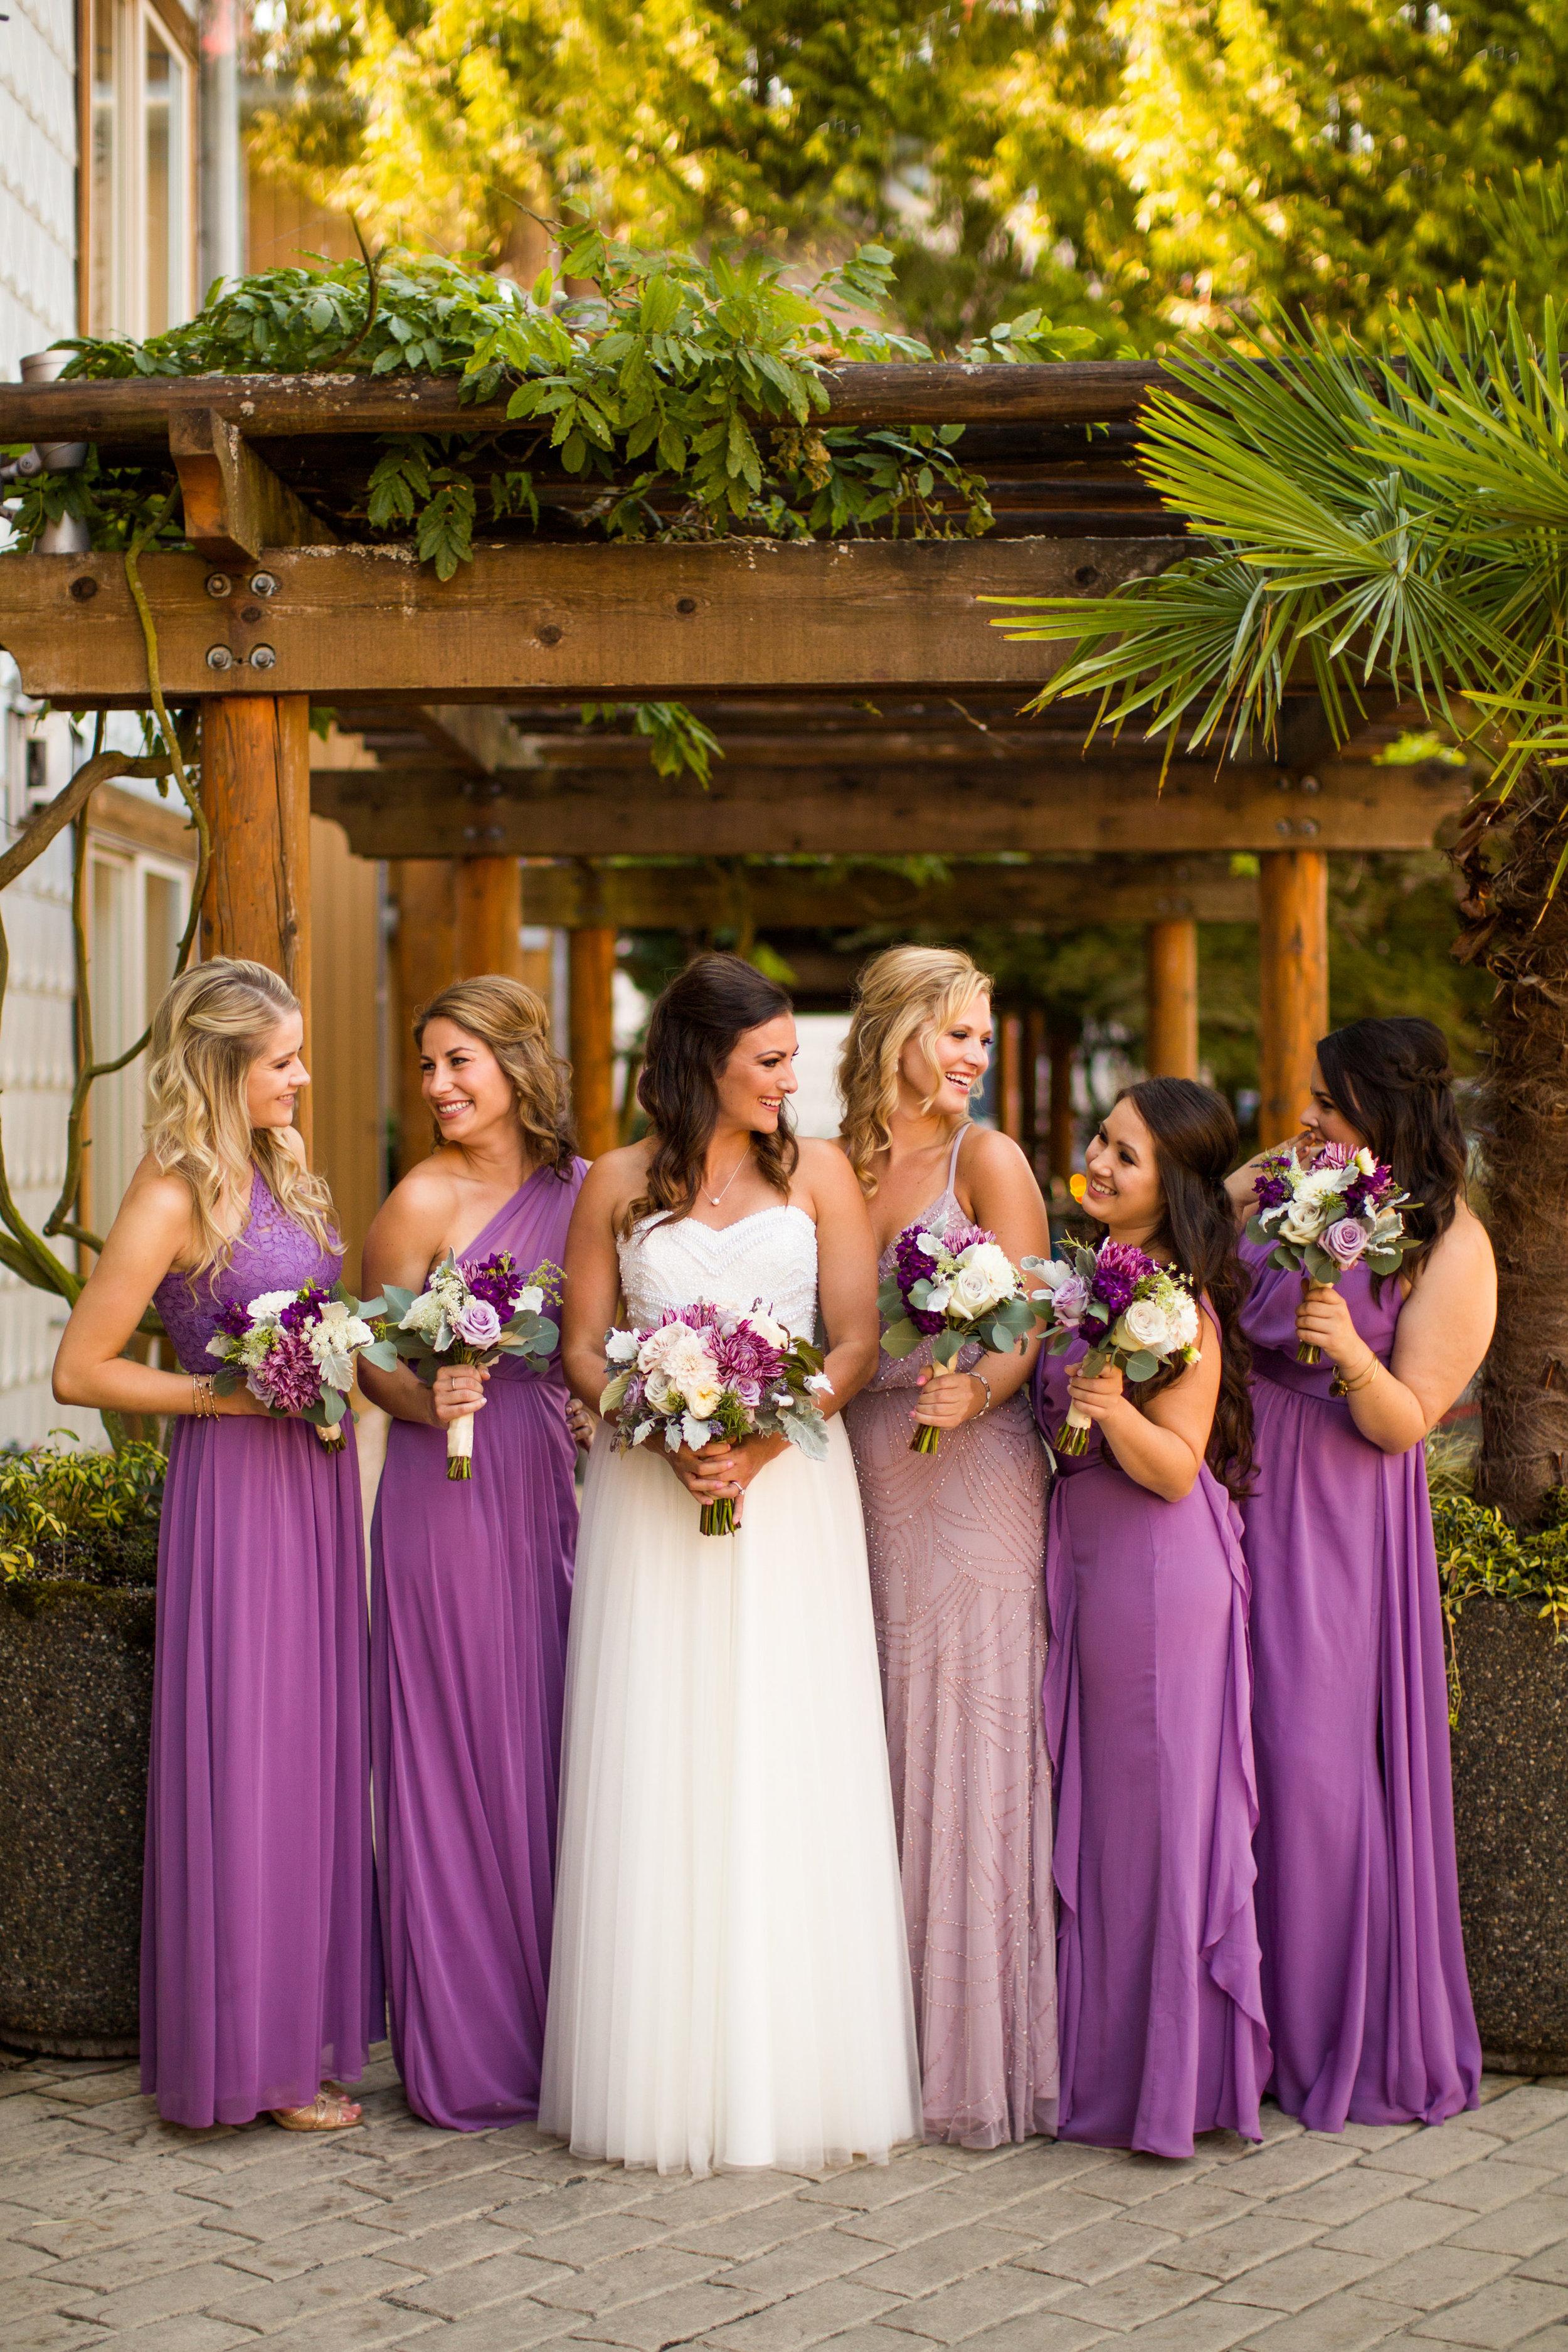 Seattle Wedding Planner, Wedding Wise | Ciccarelli Photography | Edgewater Hotel Wedding | David's Bridal bridesmaids dresses in wisteria purple